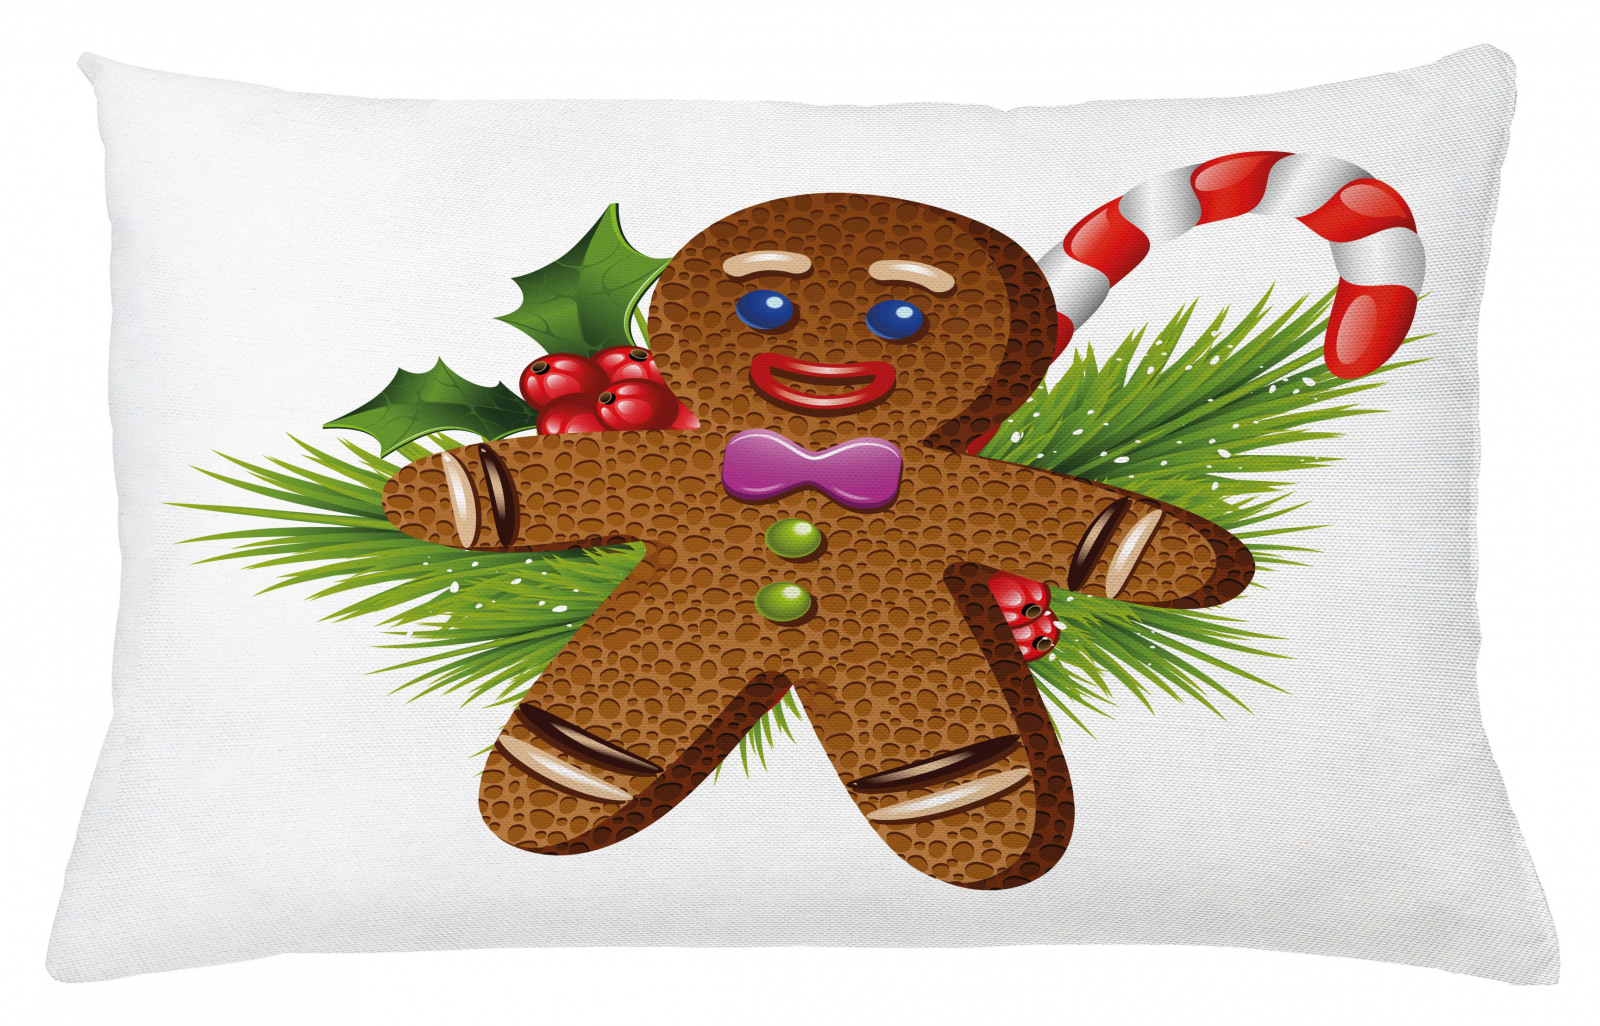 Gingerbread Man Throw Pillow Cushion Cover Christmas Ebay